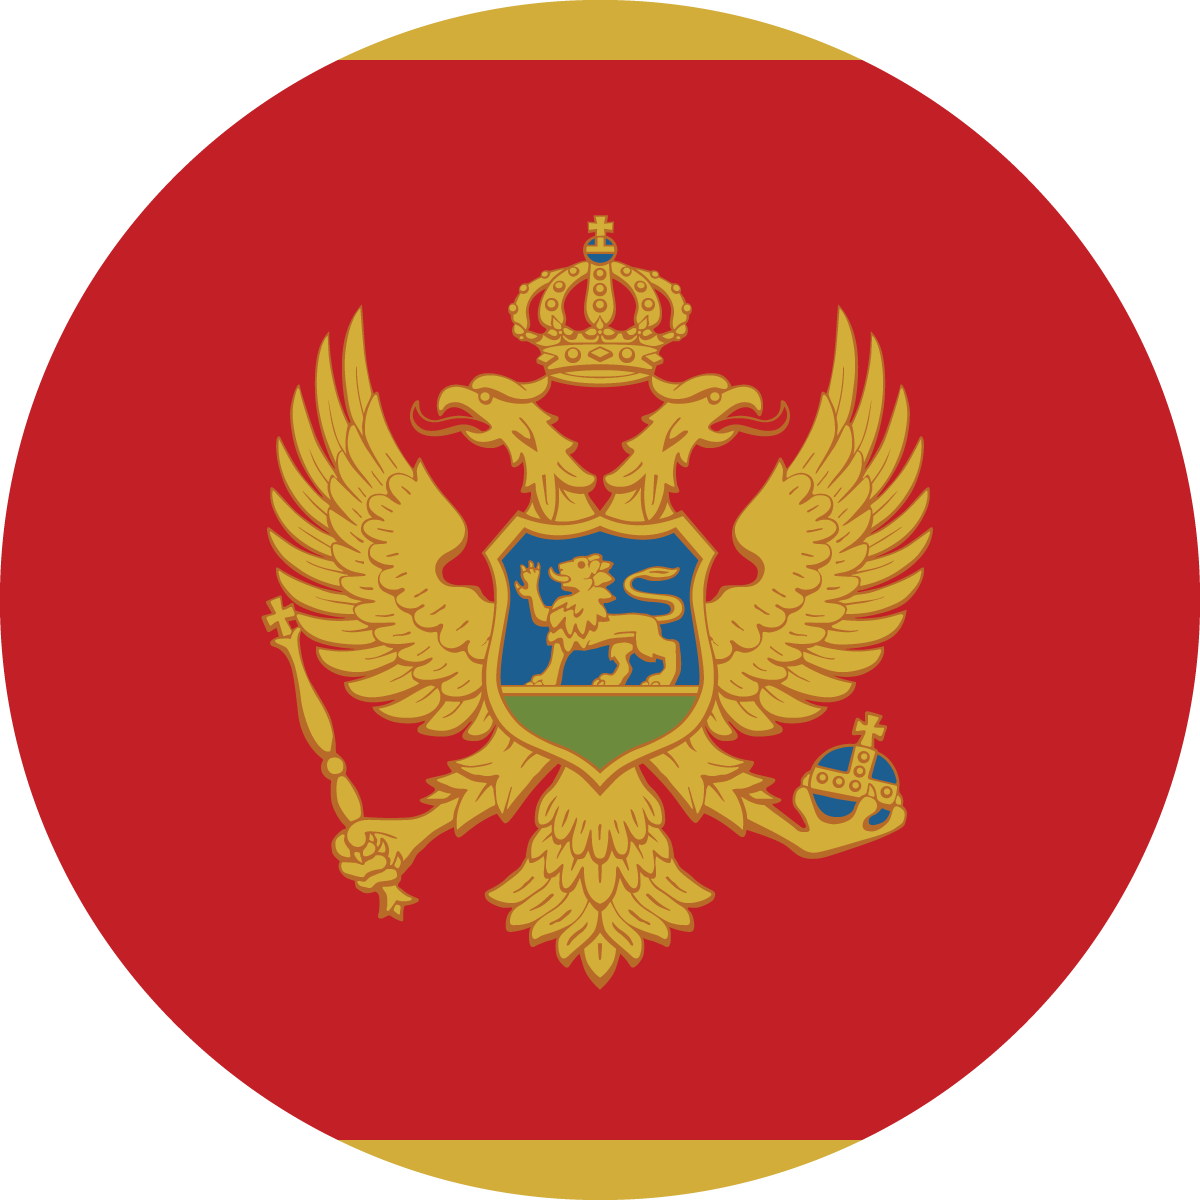 Copy of Copy of Copy of Copy of Copy of Copy of Copy of Copy of Copy of Copy of Copy of Montenegro